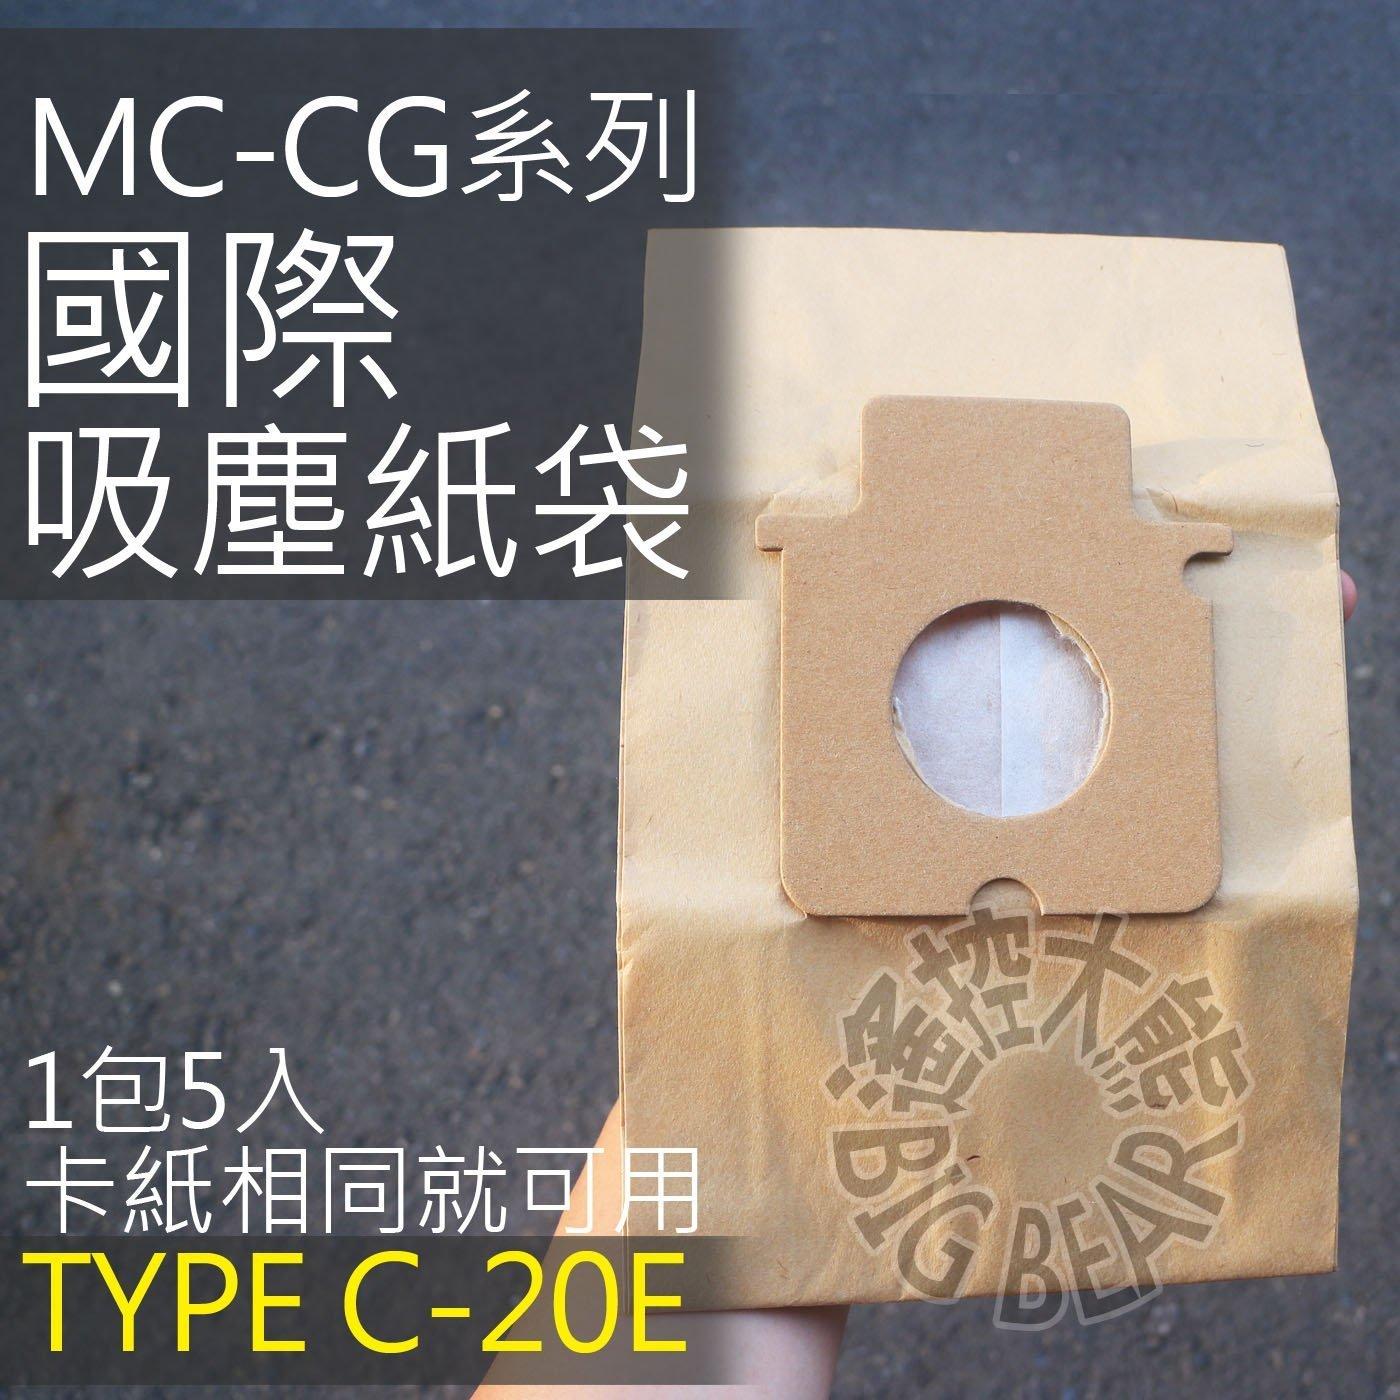 Panasonic 國際牌 吸塵器集塵紙袋 TYPE C-20E (5入) 集塵袋 MC-CG系列 MC-E7系列